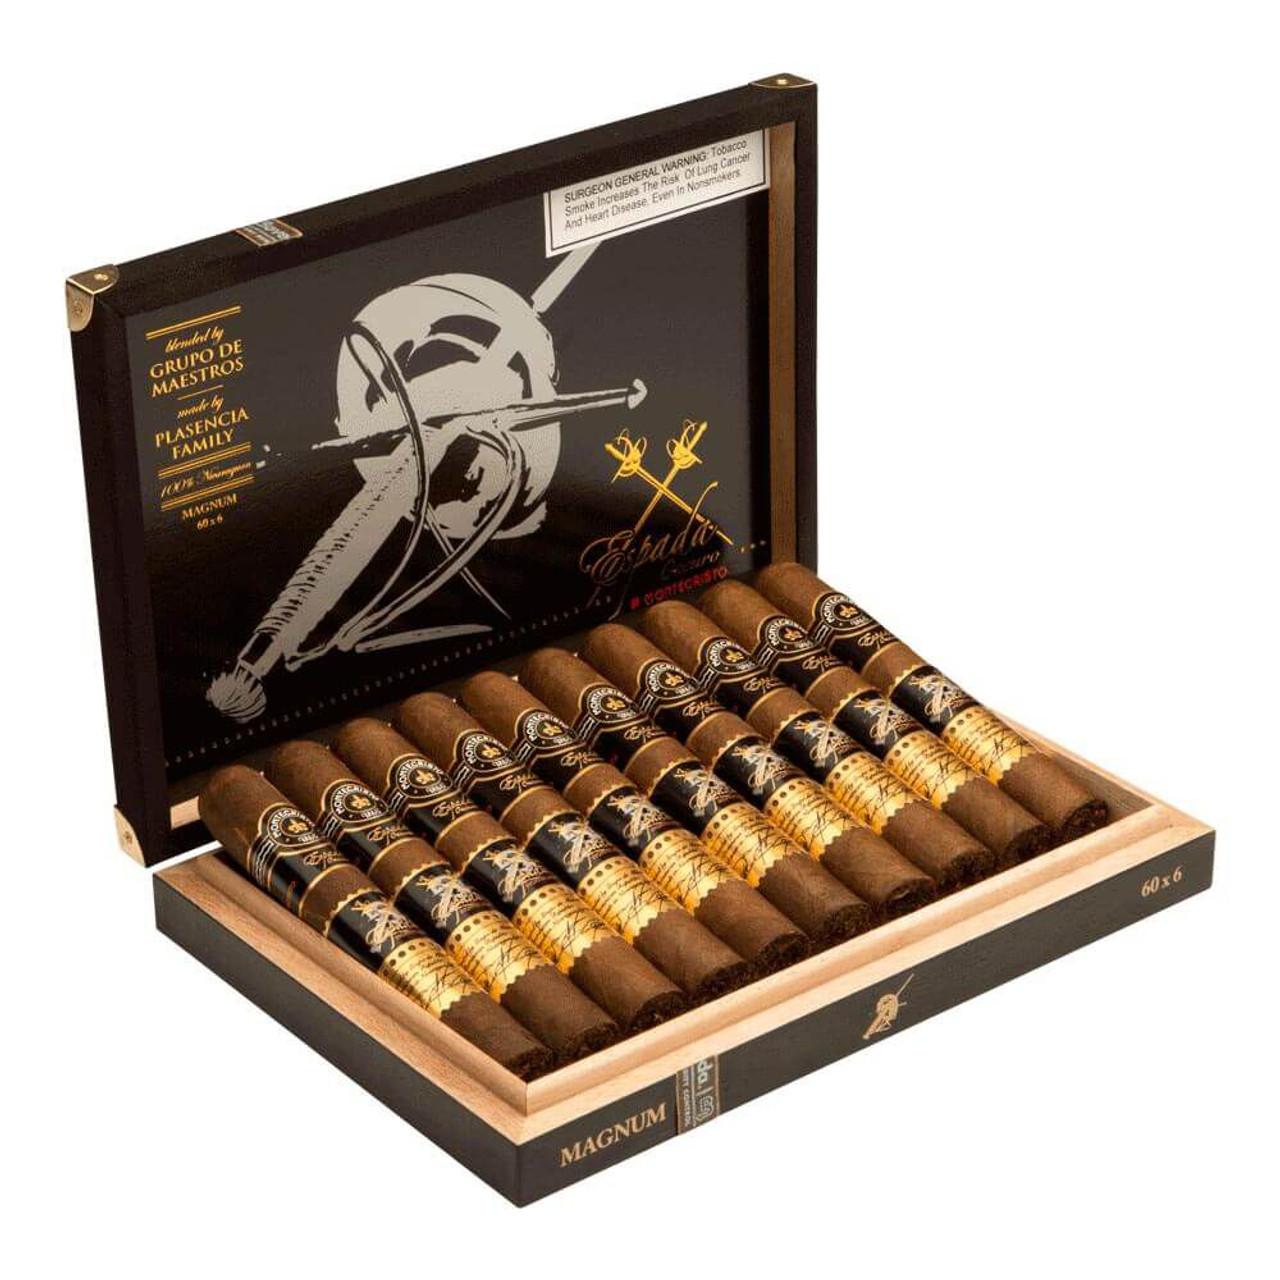 Montecristo Espada Oscuro Magnum Cigars - 6.0 x 60 (Box of 10)